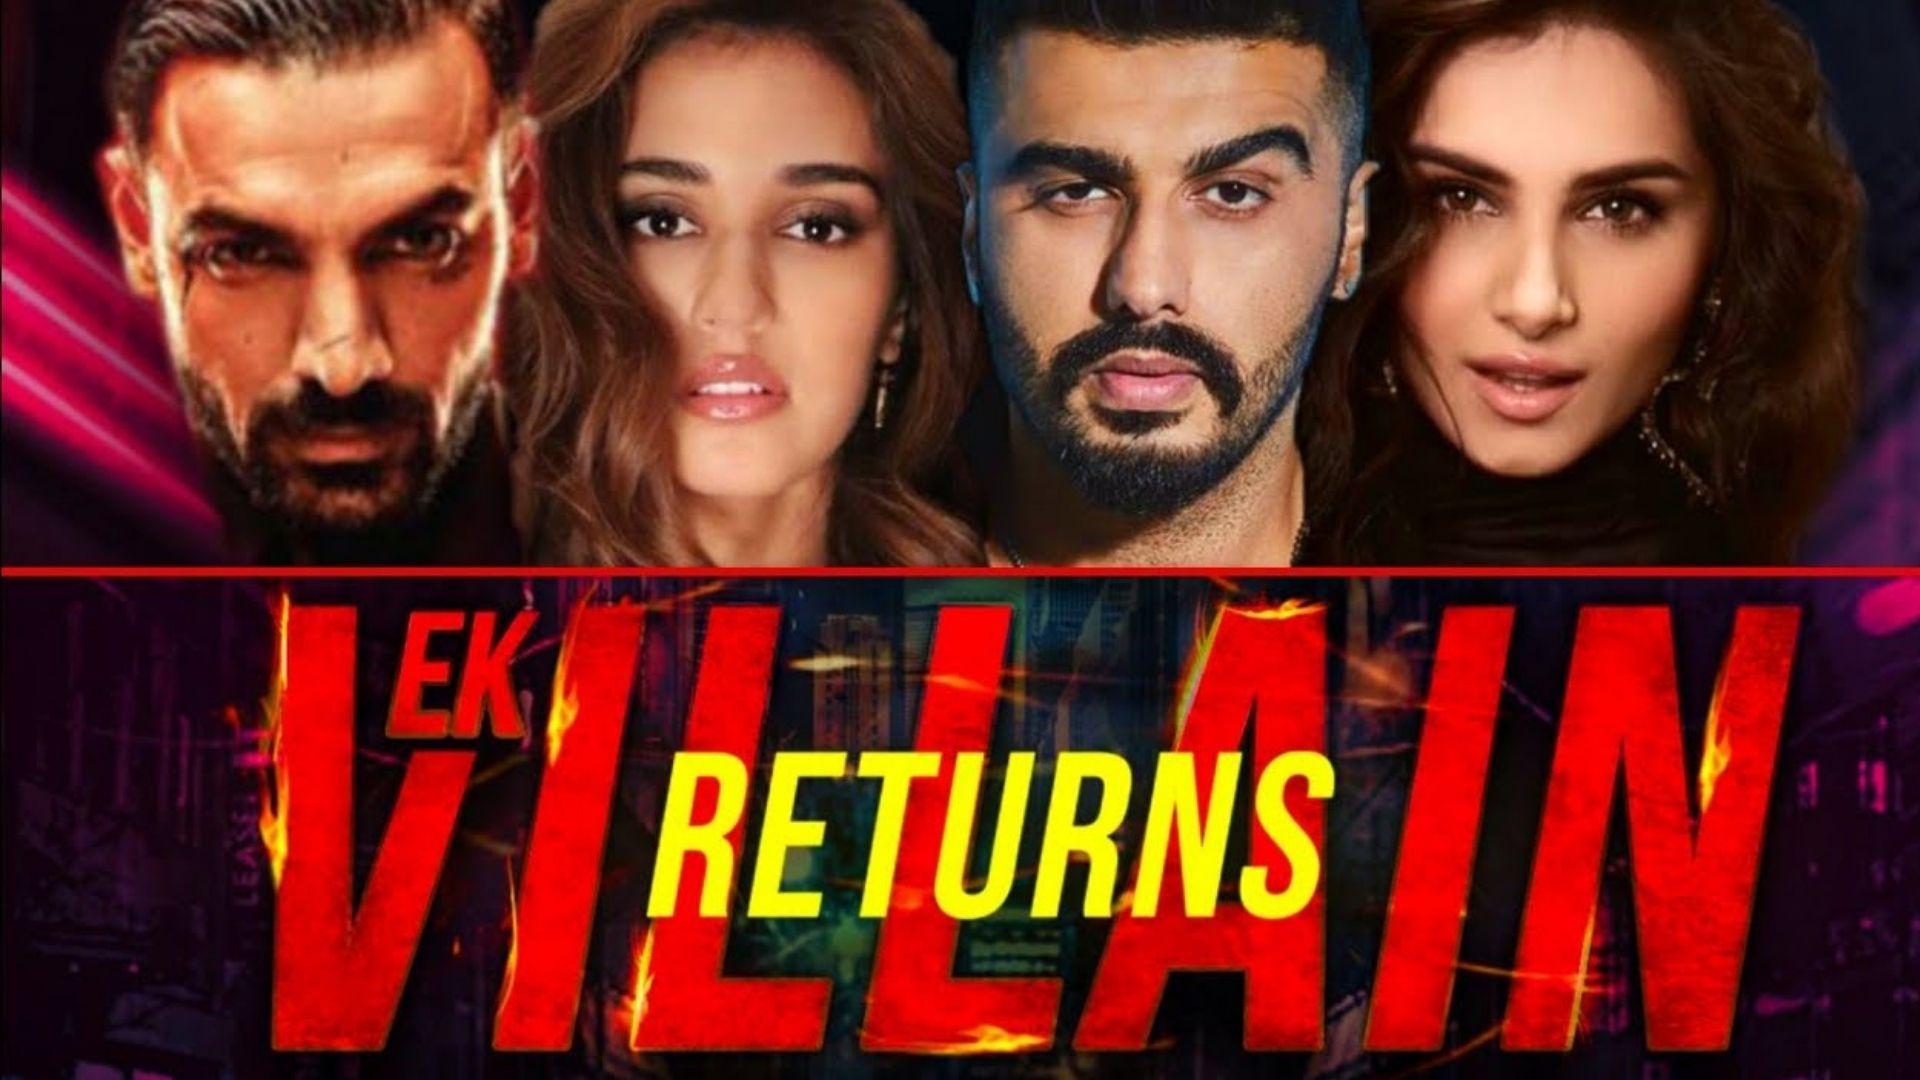 Ek Villain Returns: John Abraham, Arjun Kapoor, Disha Patani And Tara Sutaria Starrer Film To Release On THIS Date In Theatres